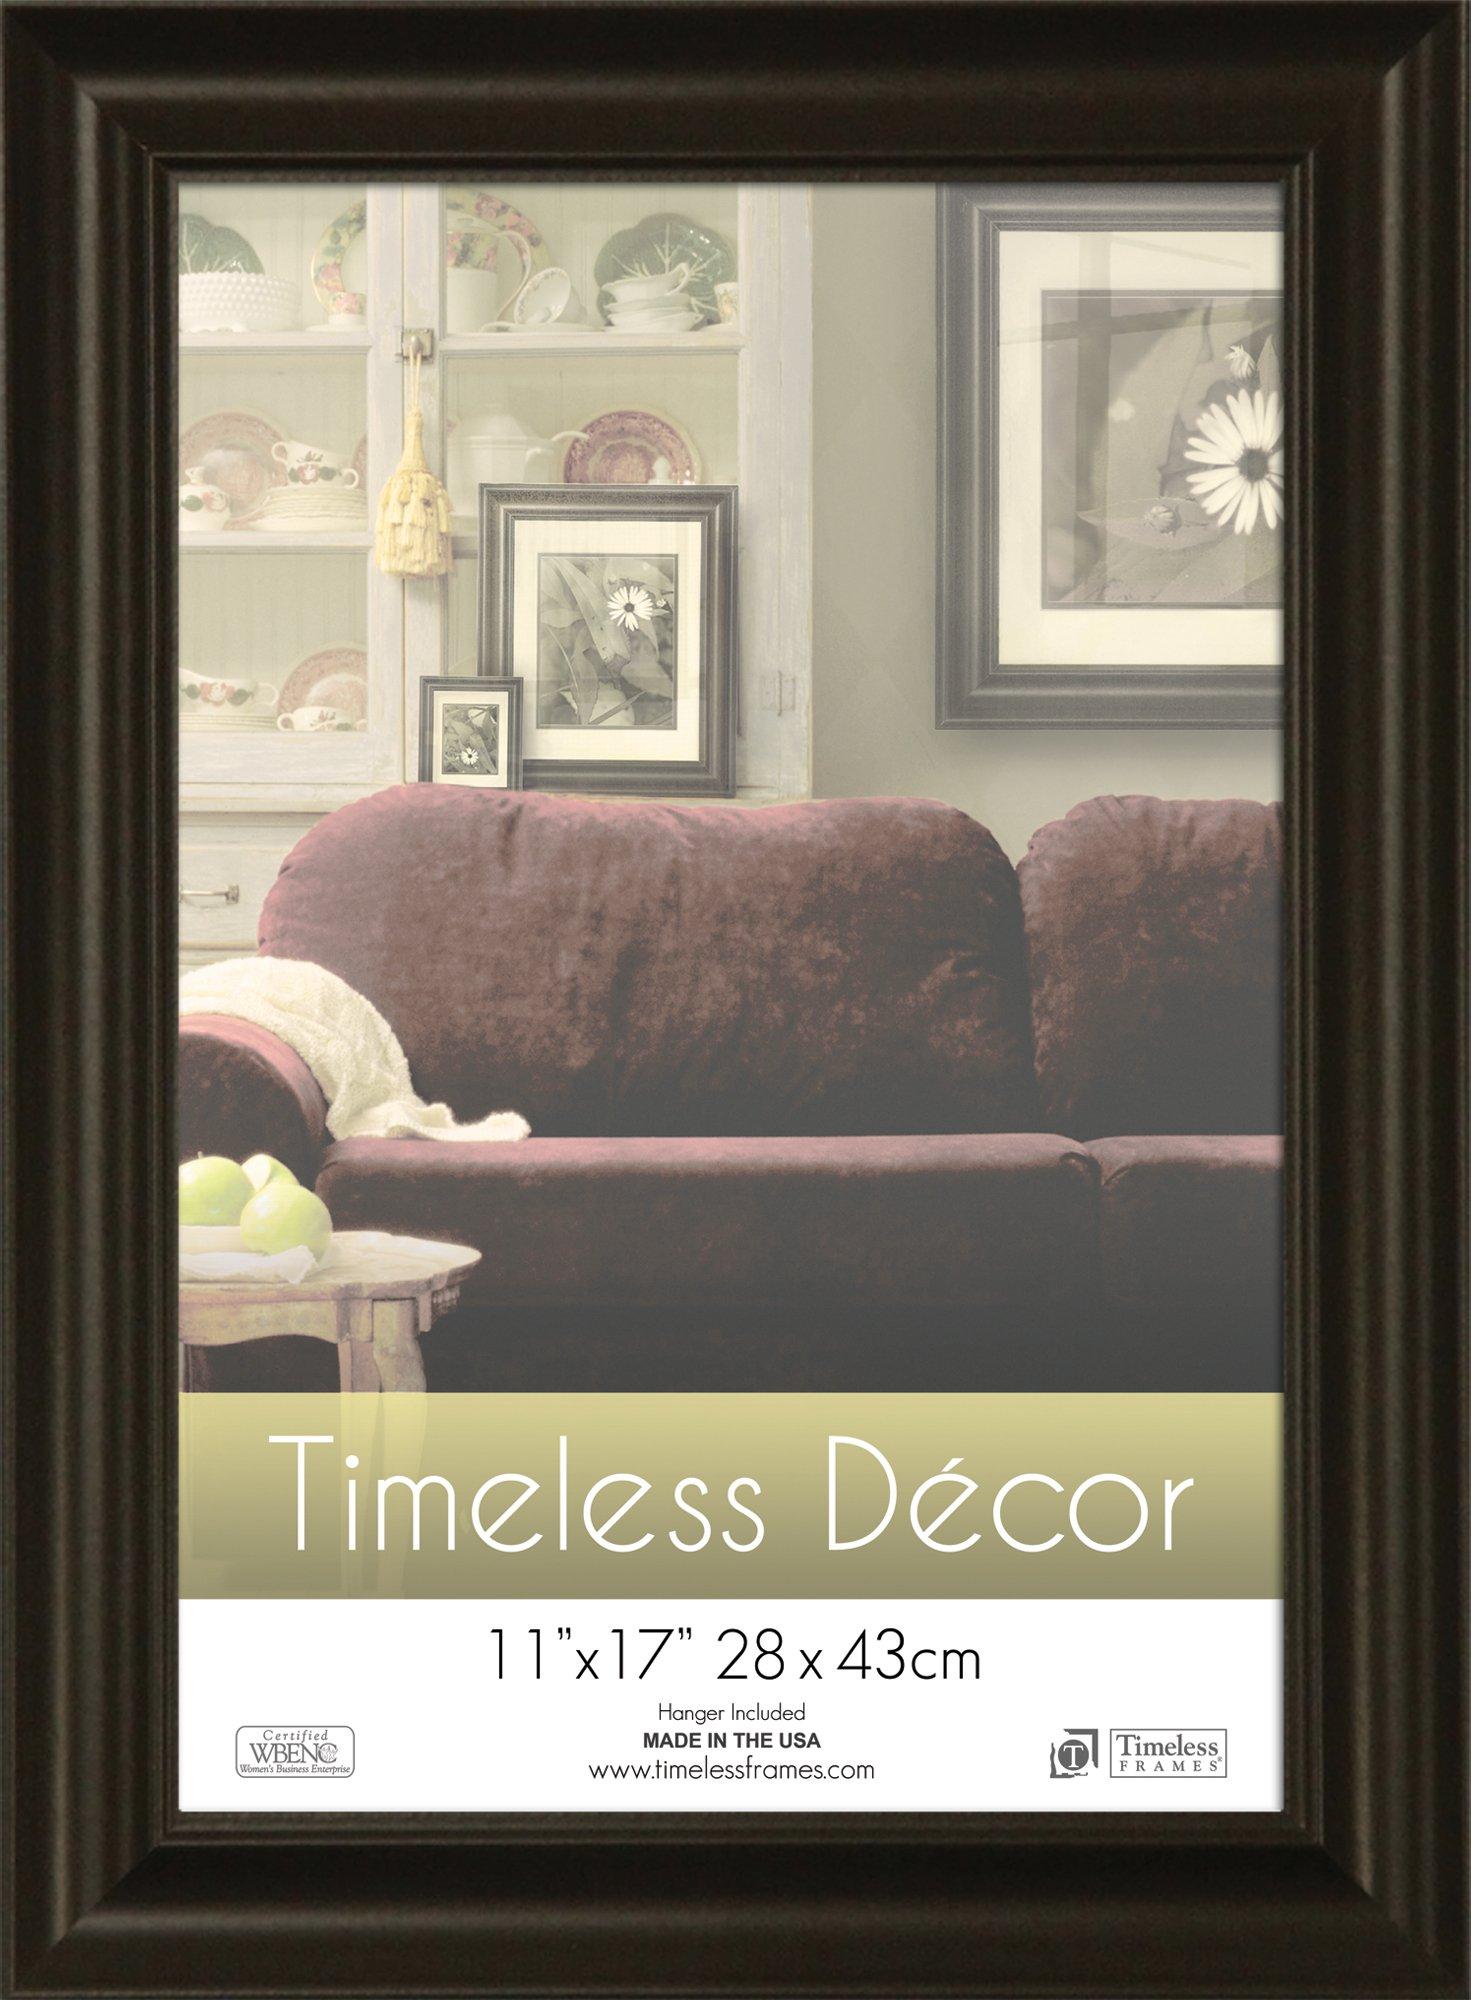 Timeless Frames 11x17 Inch Boca Picture Frame, Black